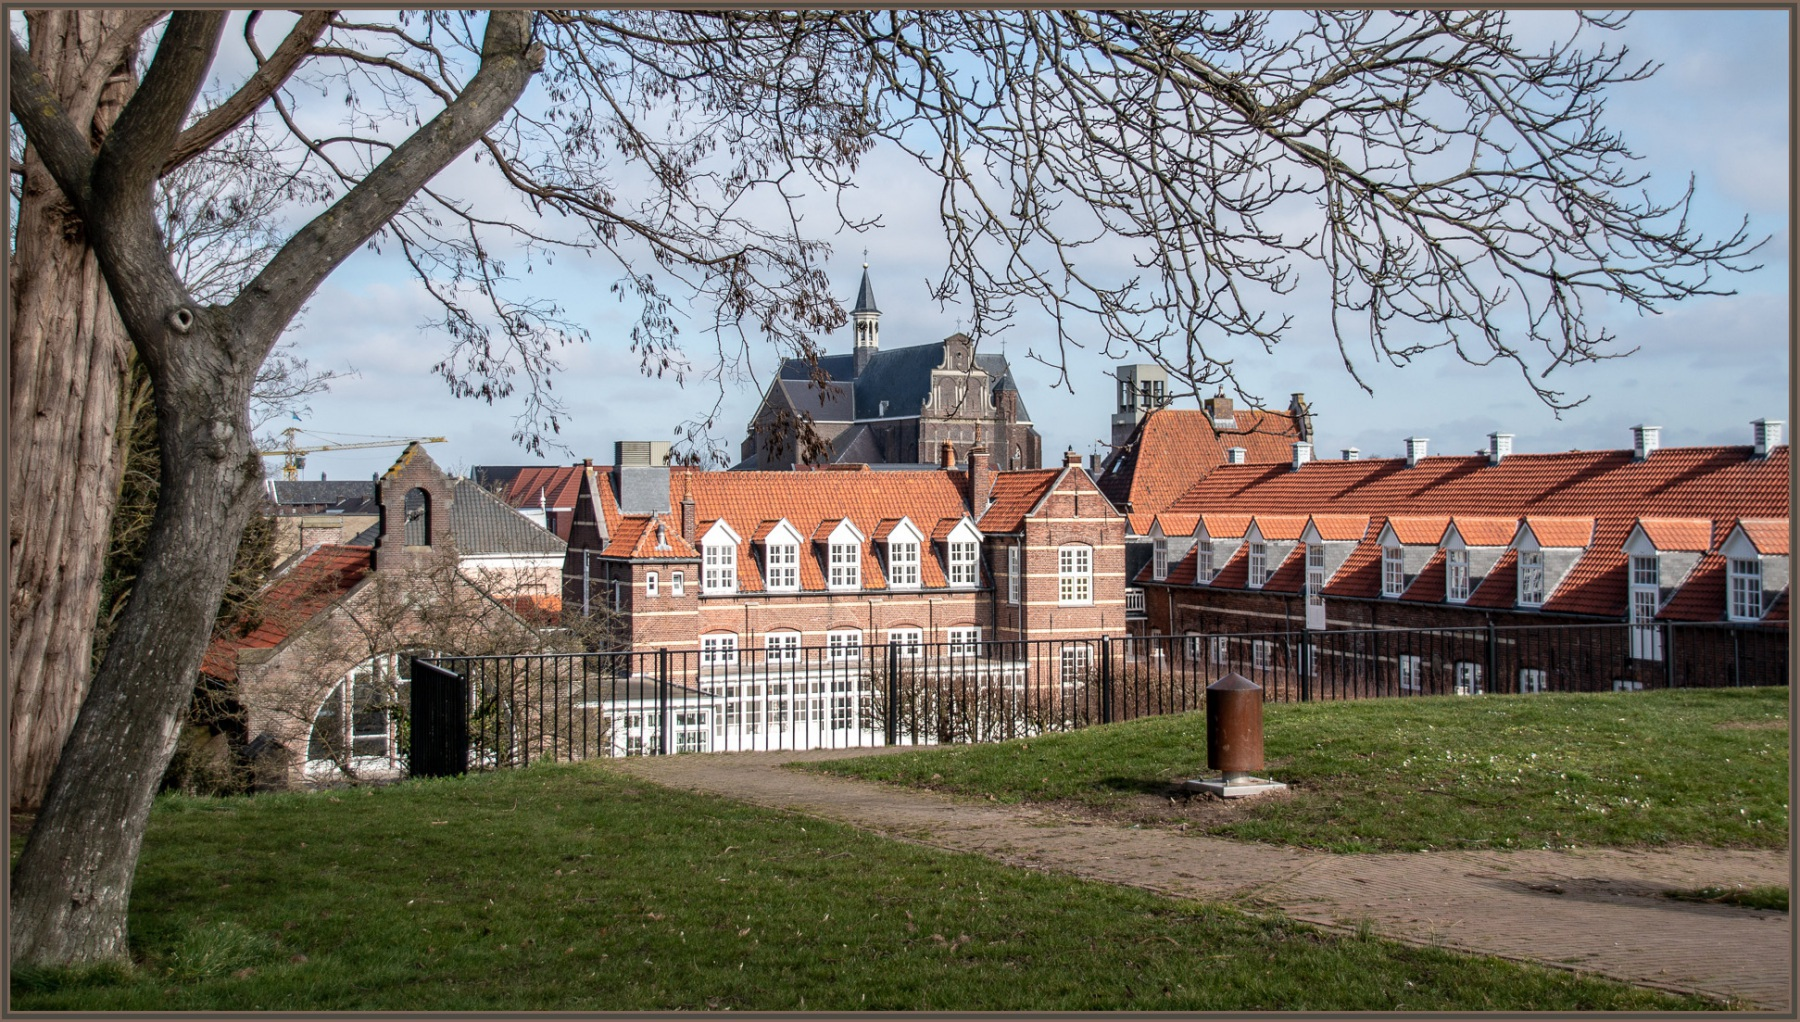 Gerda-van-Leuken-Oud-Grave